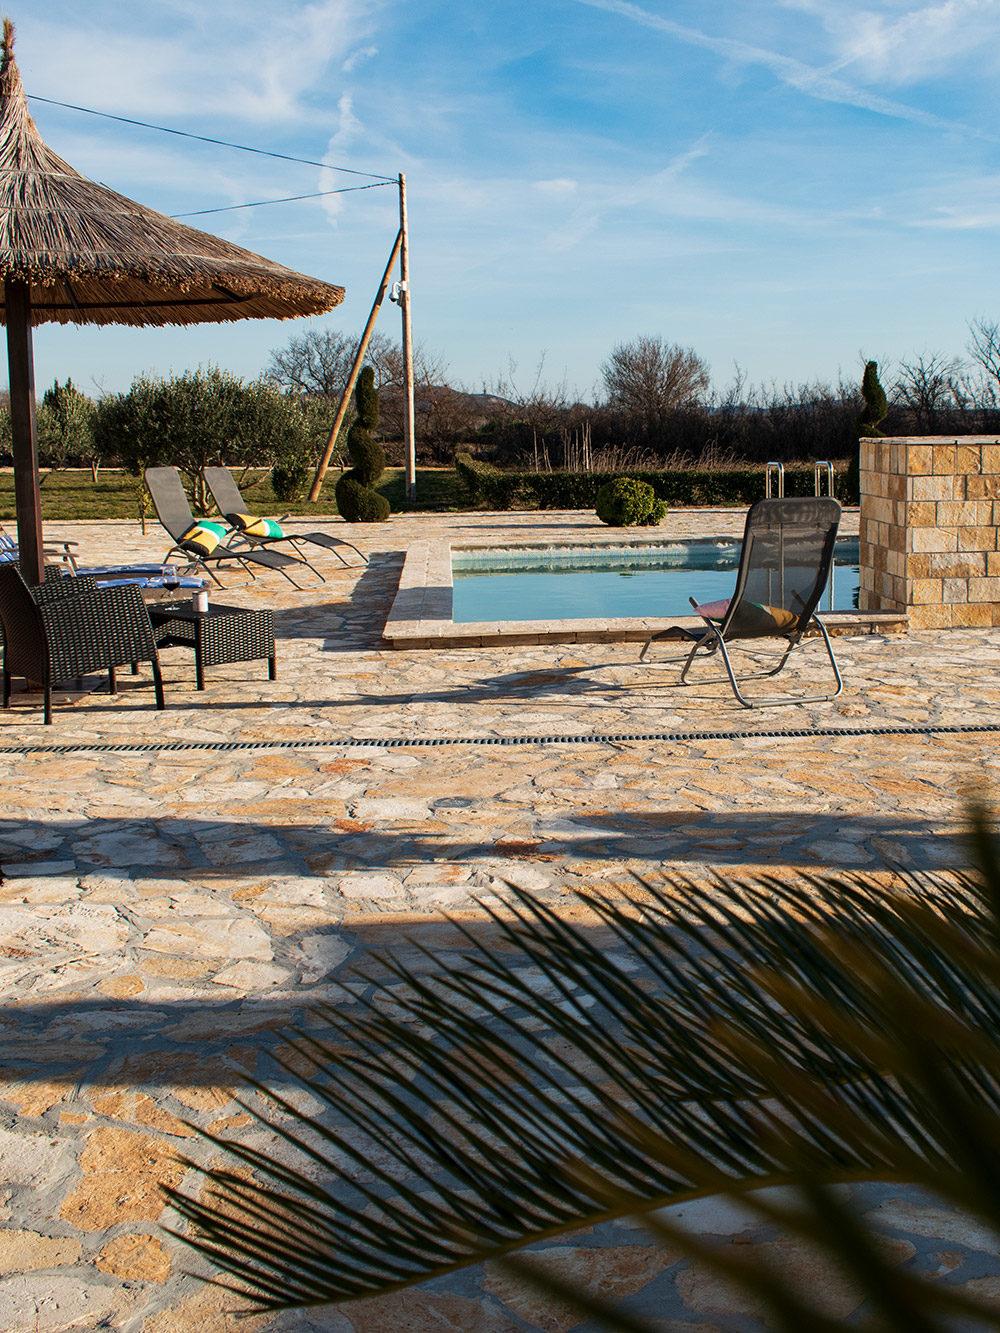 AP Villa Pristeg - Pool area and palm tree